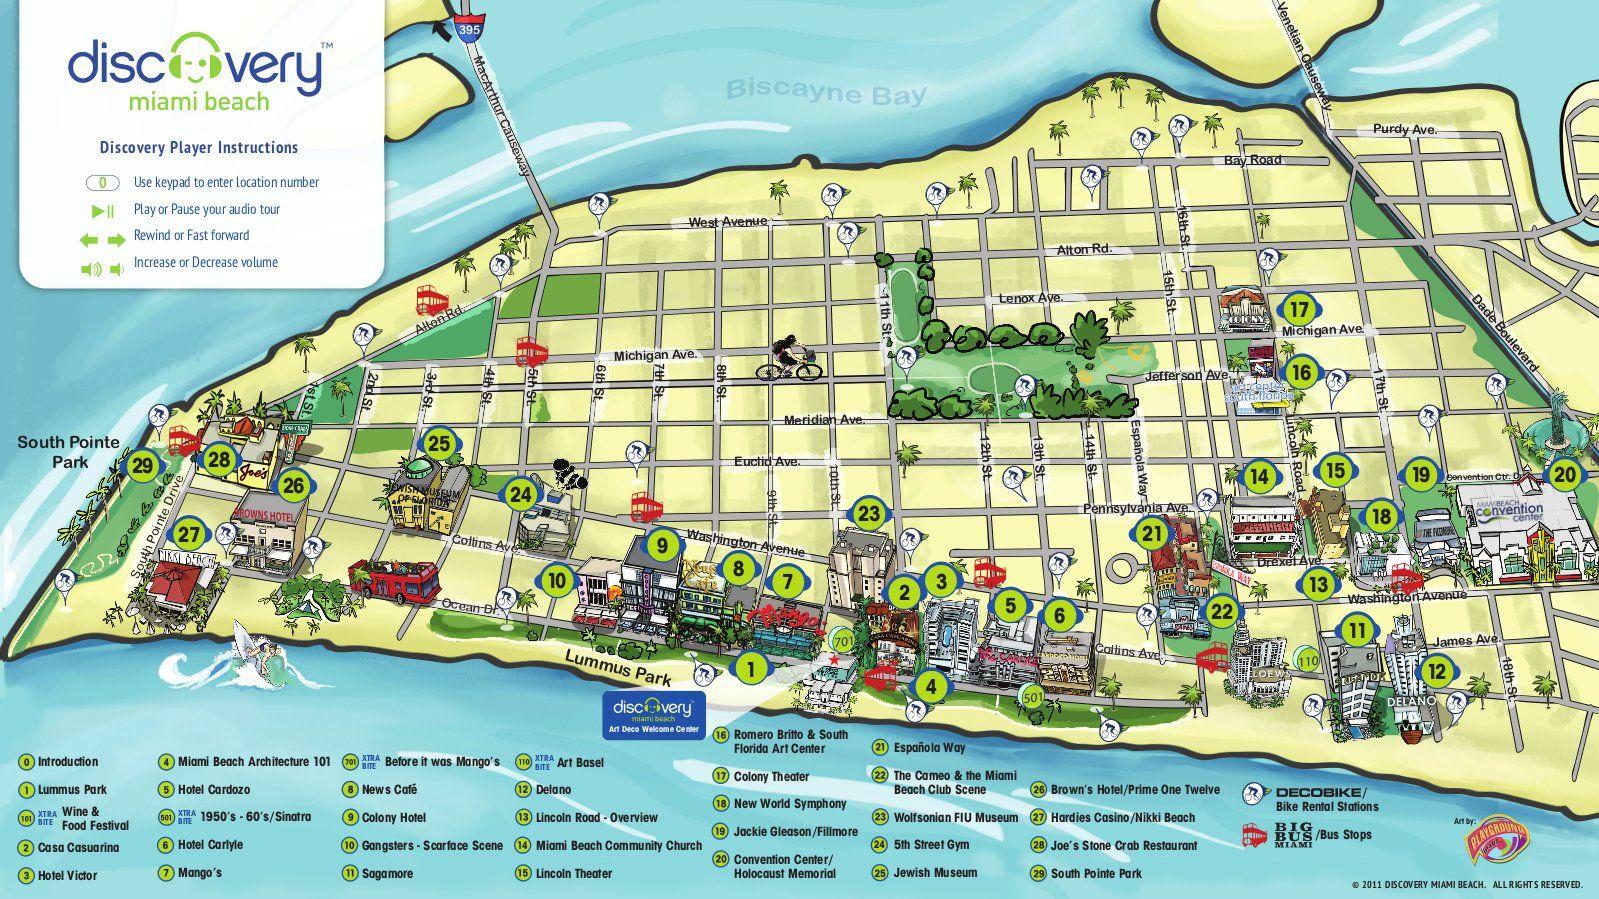 Art Deco Miami South Beach Map マイアミ 撮影 アールデコ